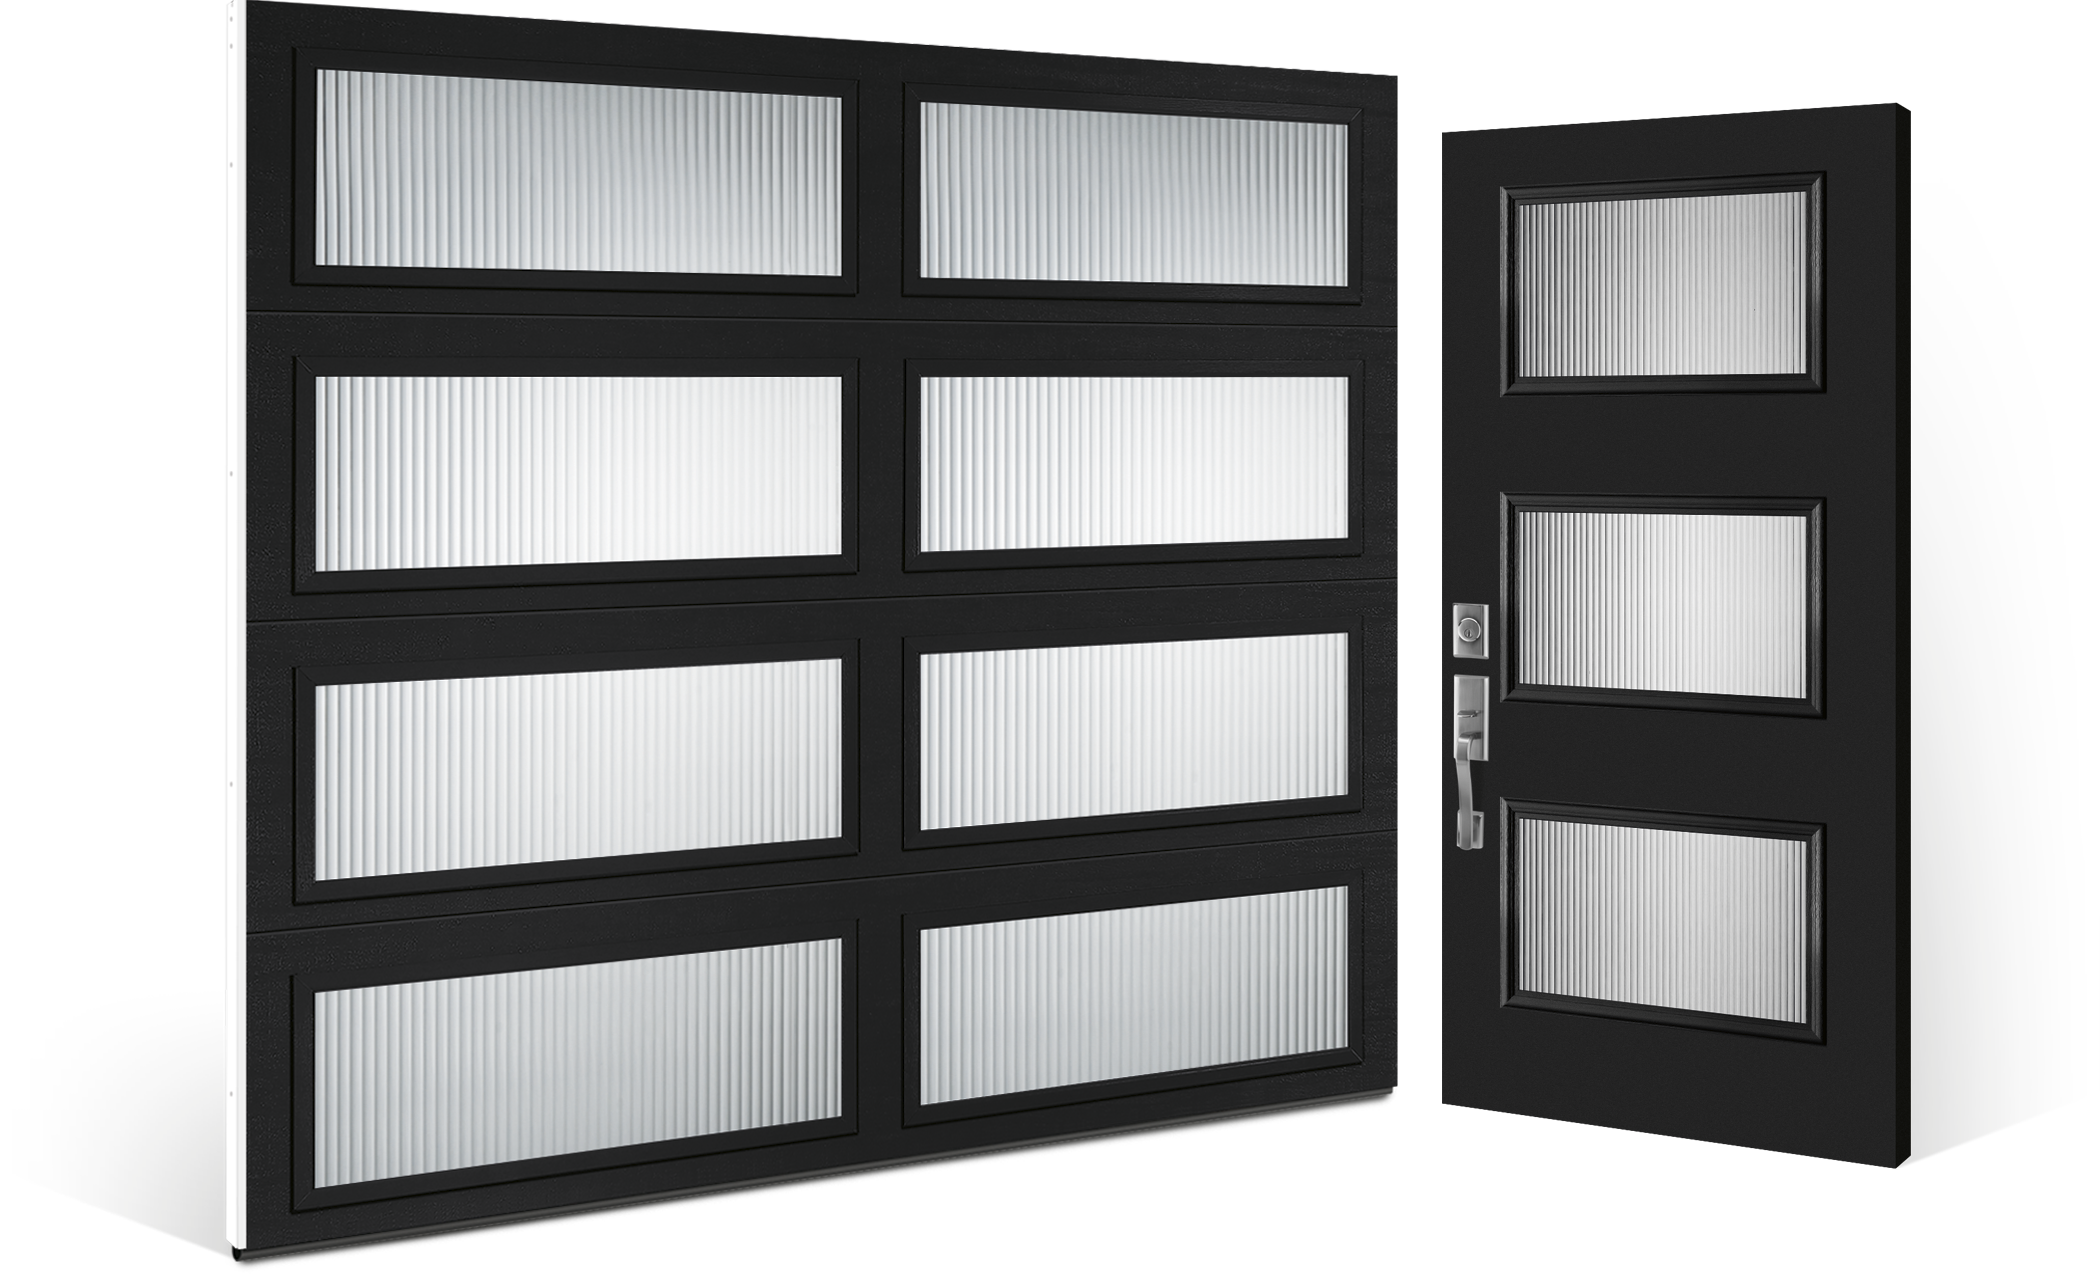 Modern Steel Garage Door Installed Pricing One Clear Choice Garage Doors Atlanta